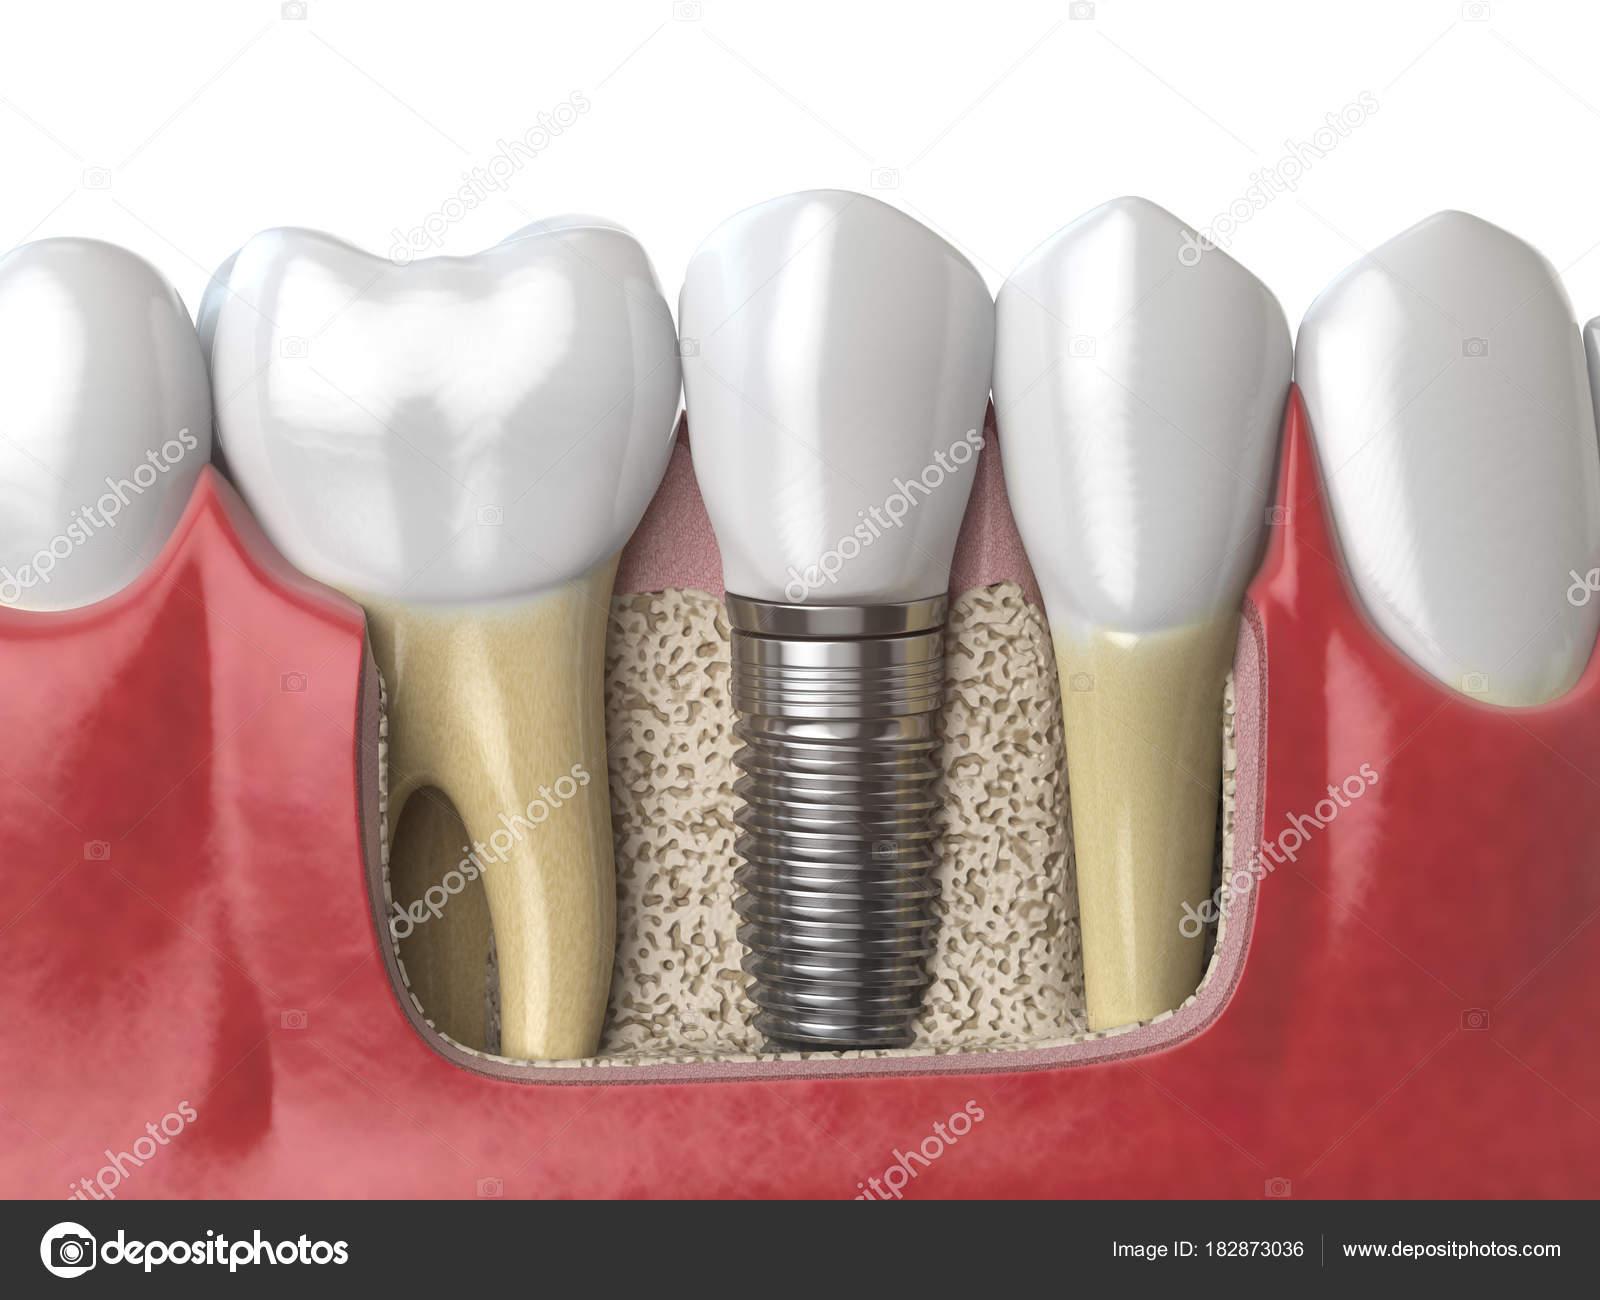 Anatomy of healthy teeth and tooth dental implant in human dentu ...